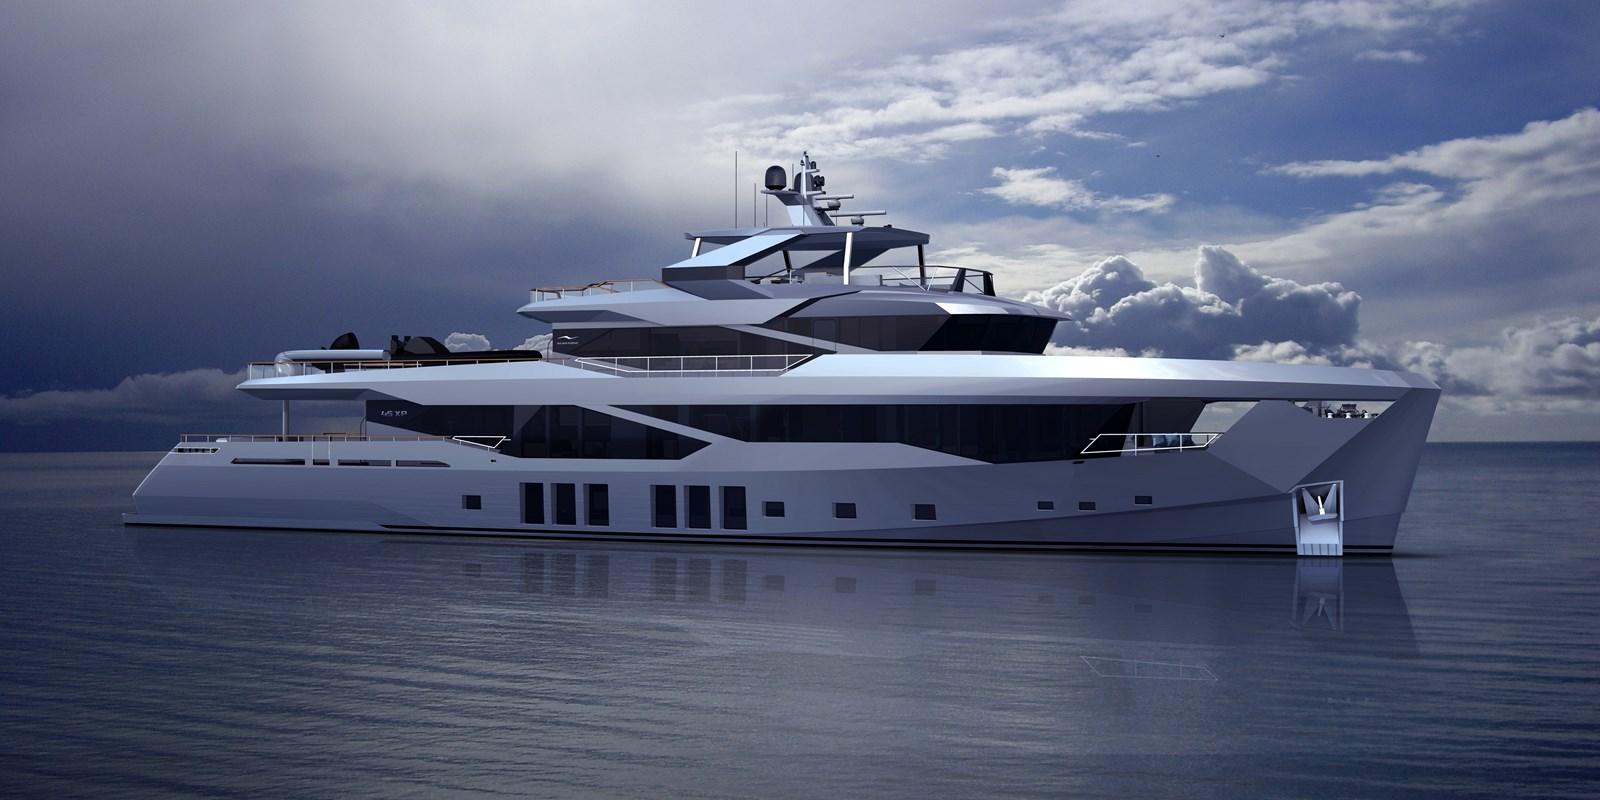 snp005B_resize 2021 NUMARINE 45XP Expedition Yacht 2967545